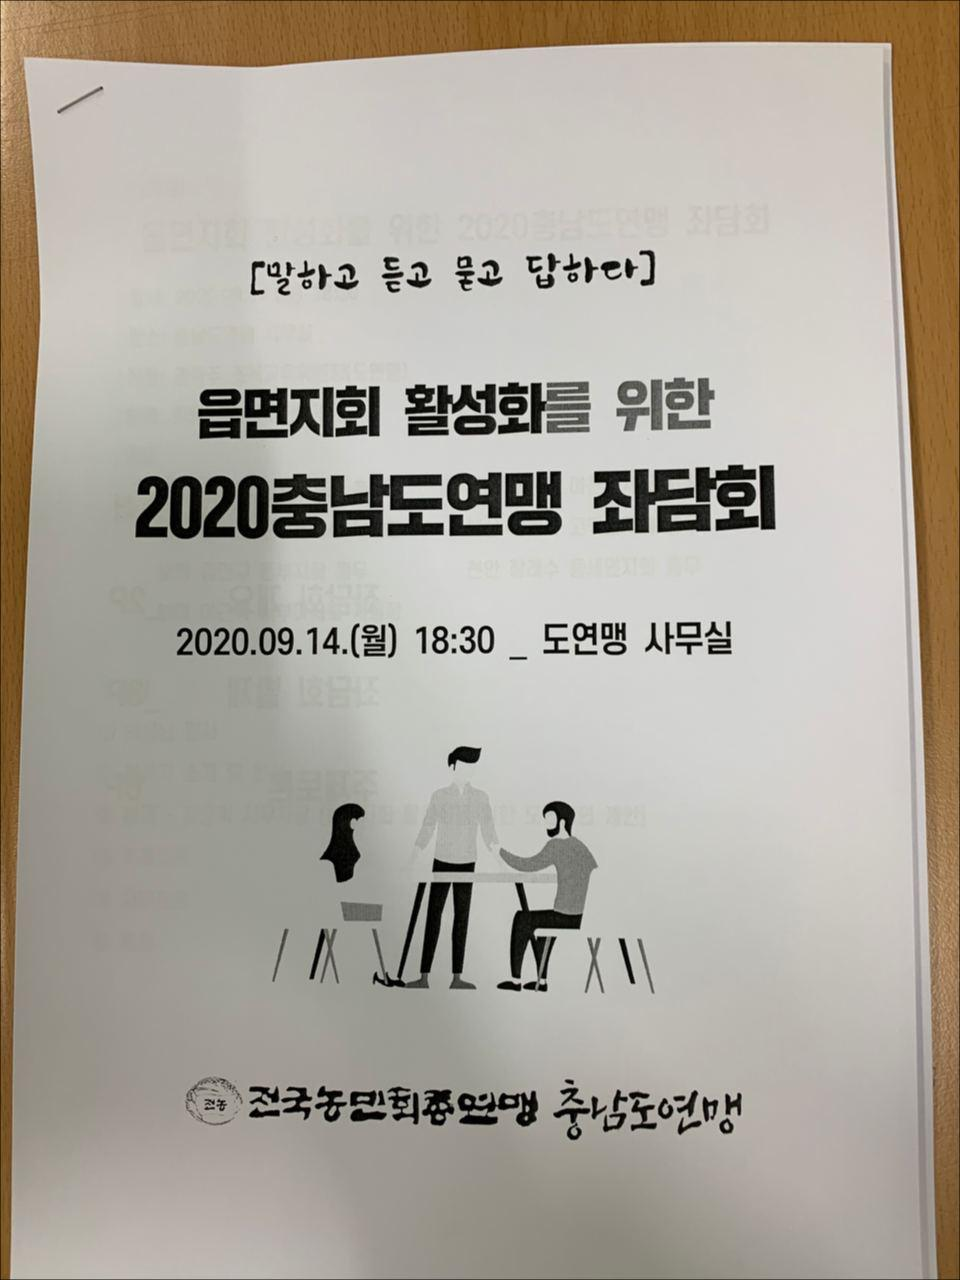 photo_2020-09-15_11-51-26.jpg